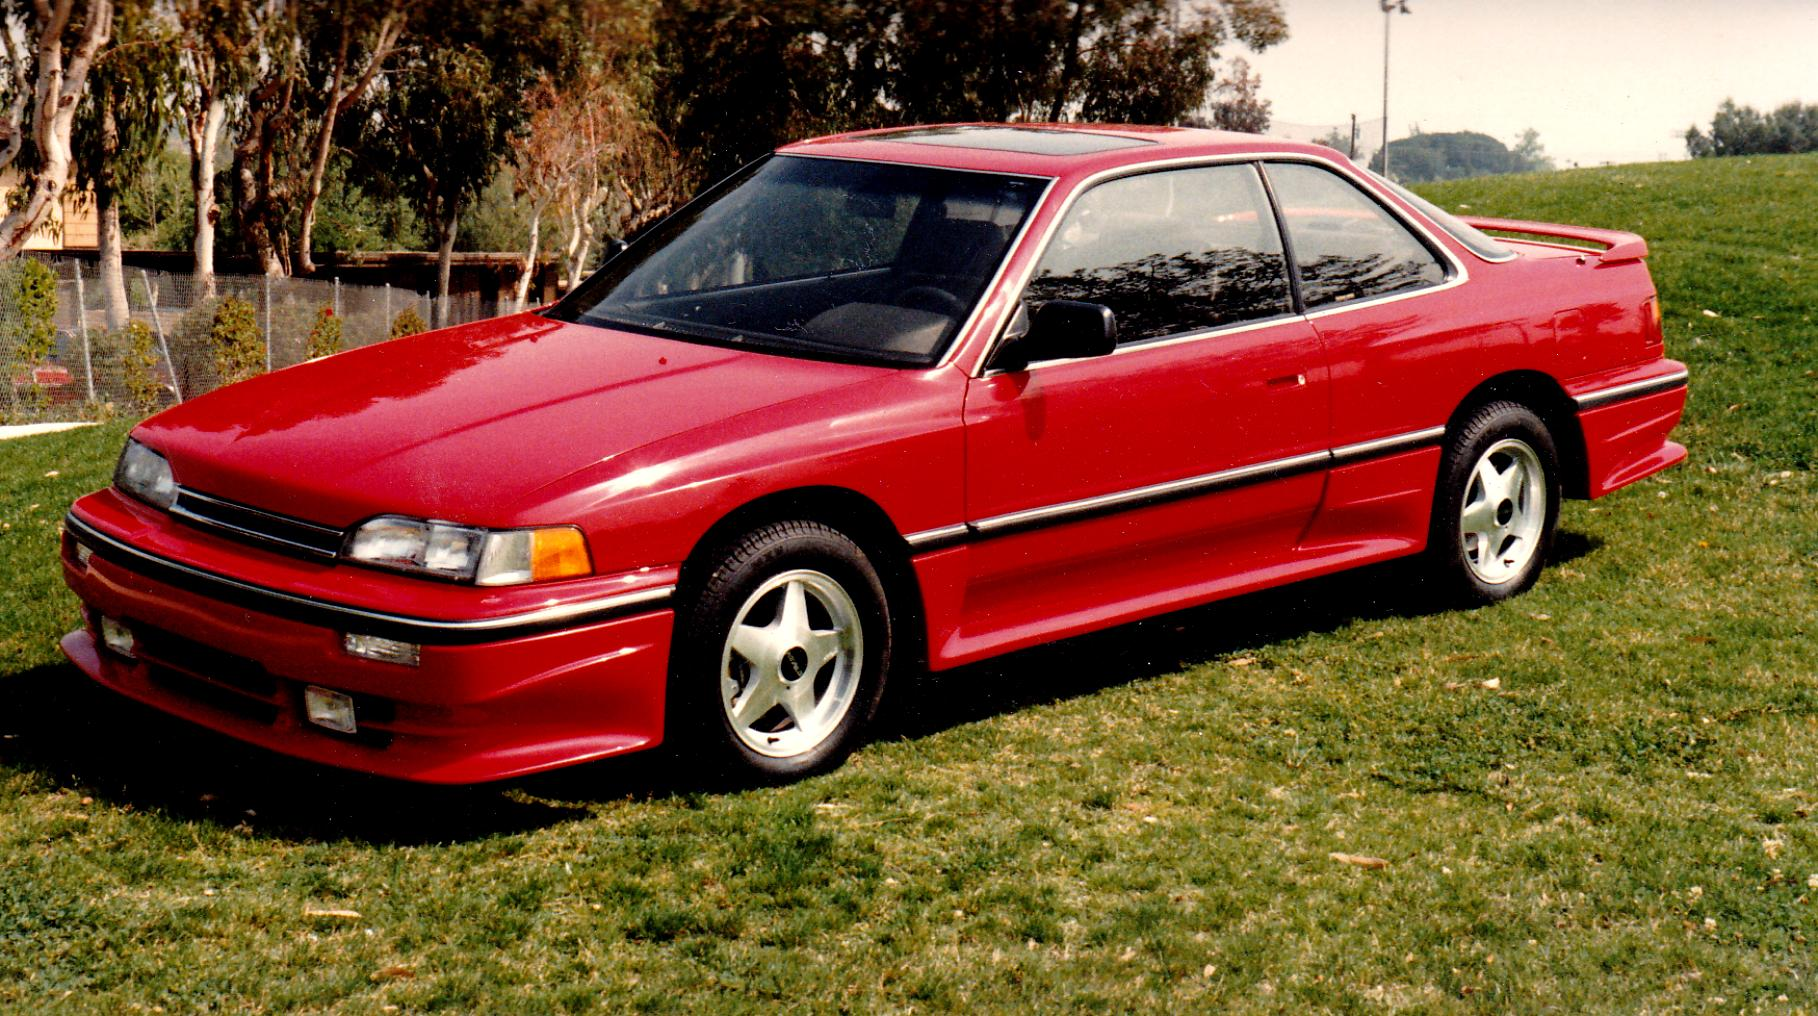 Acura Legend Coupe 1987 On Motoimg Com